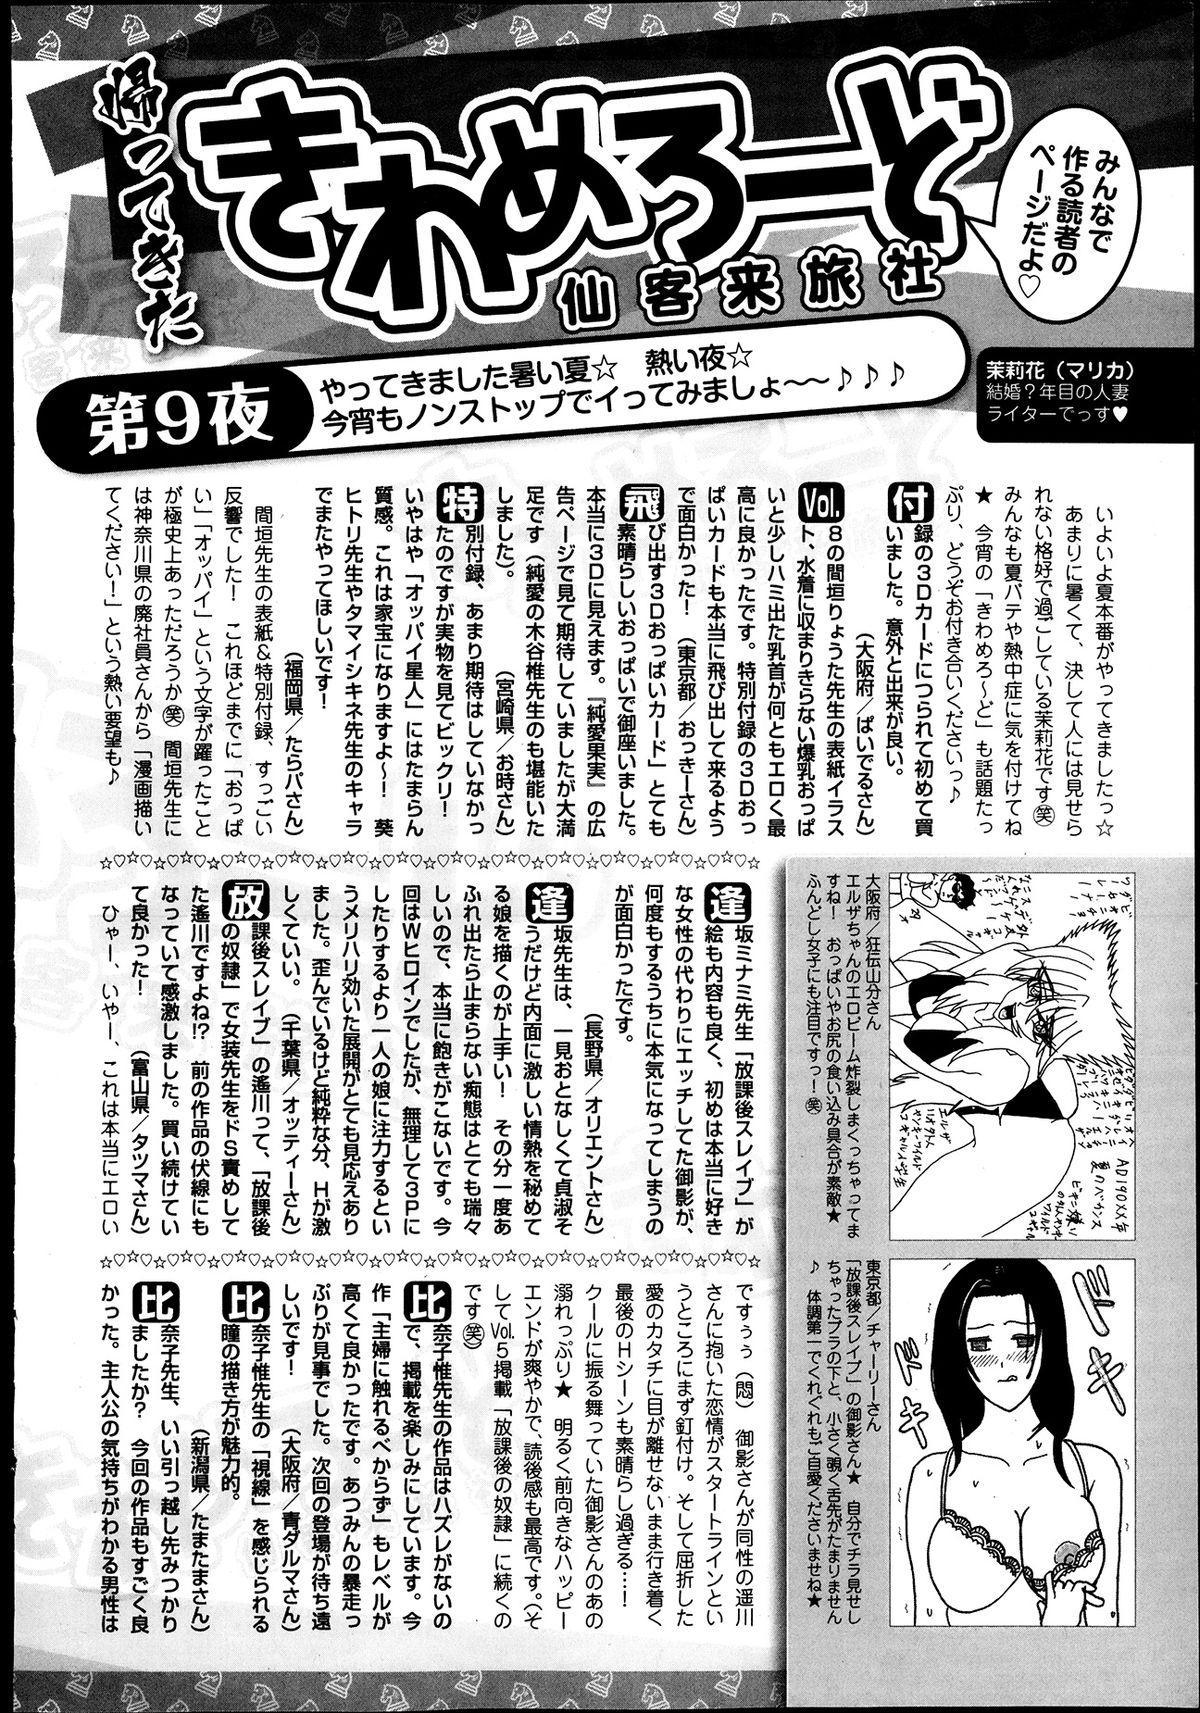 Bishoujo Kakumei KIWAME Road Vol.9 259